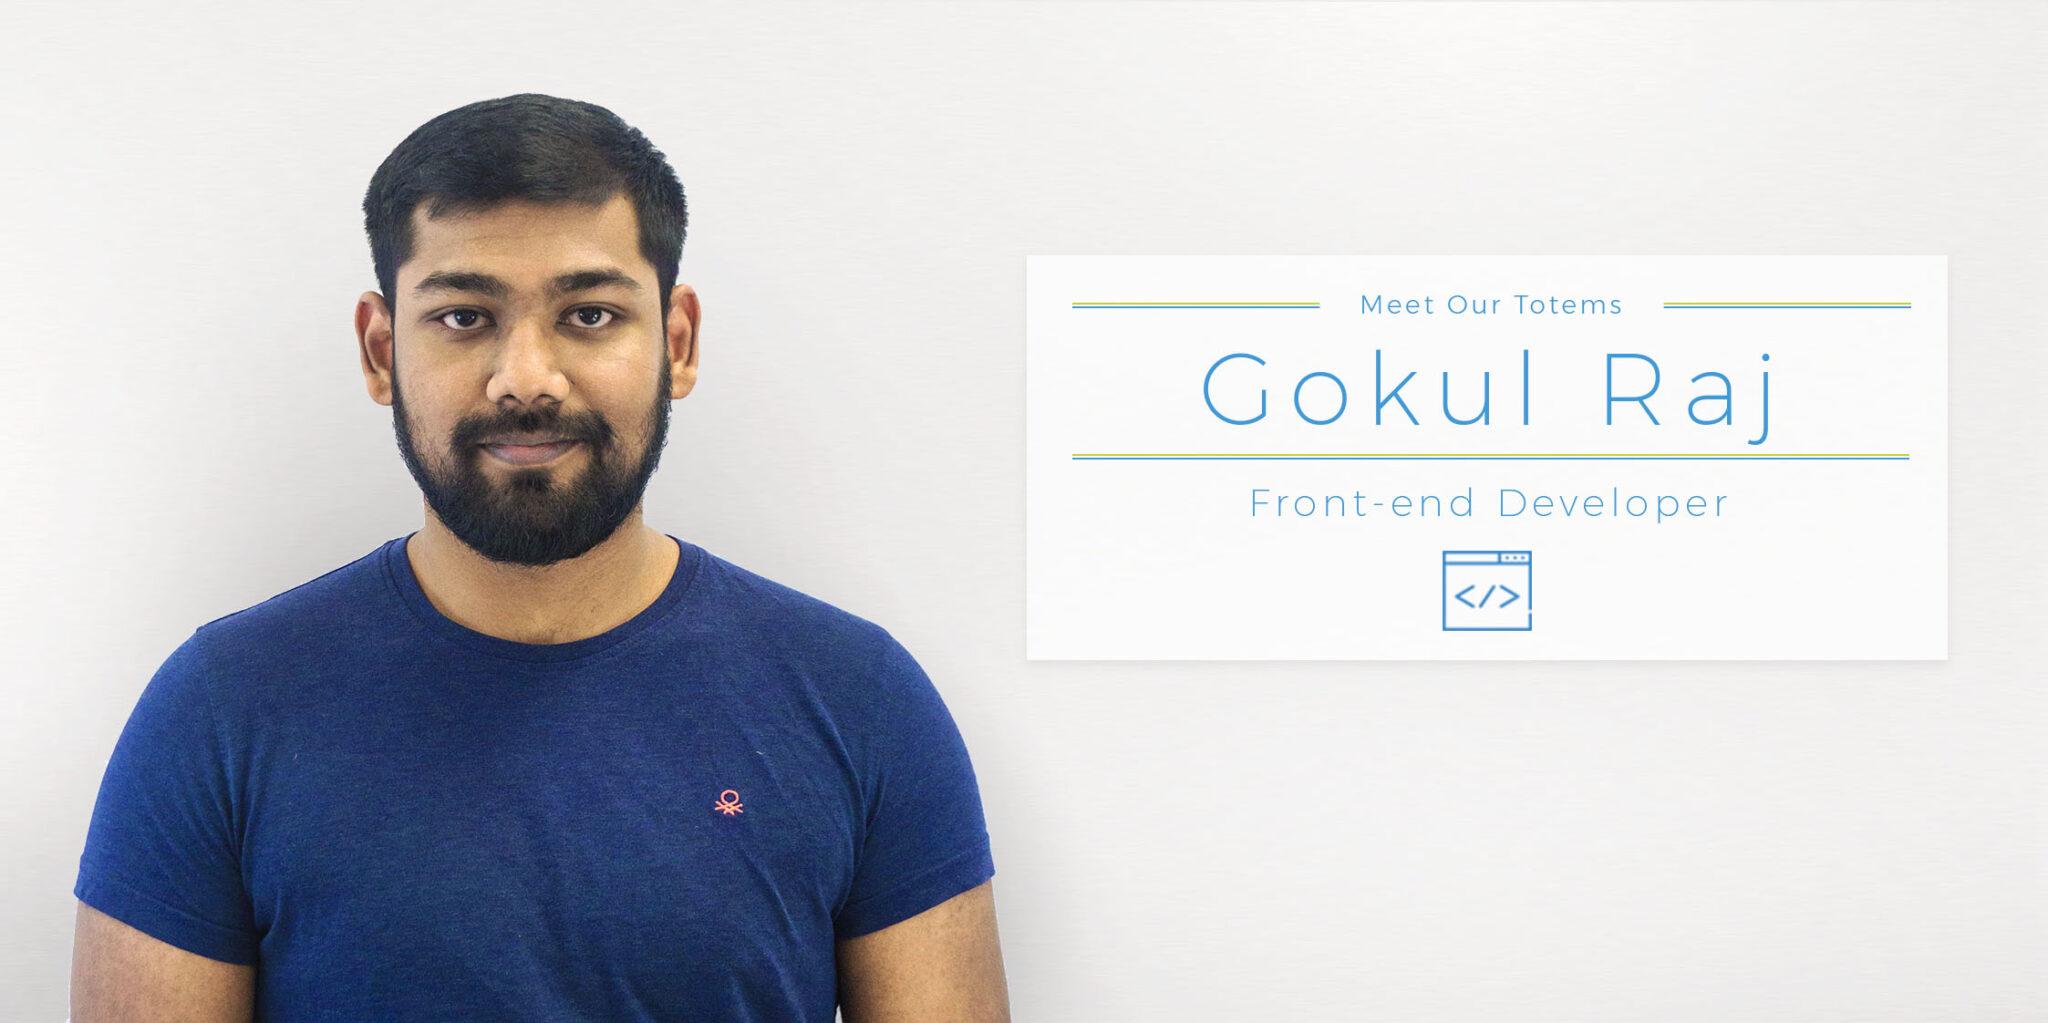 Meet your totems: Front End Developer Gokul Raj